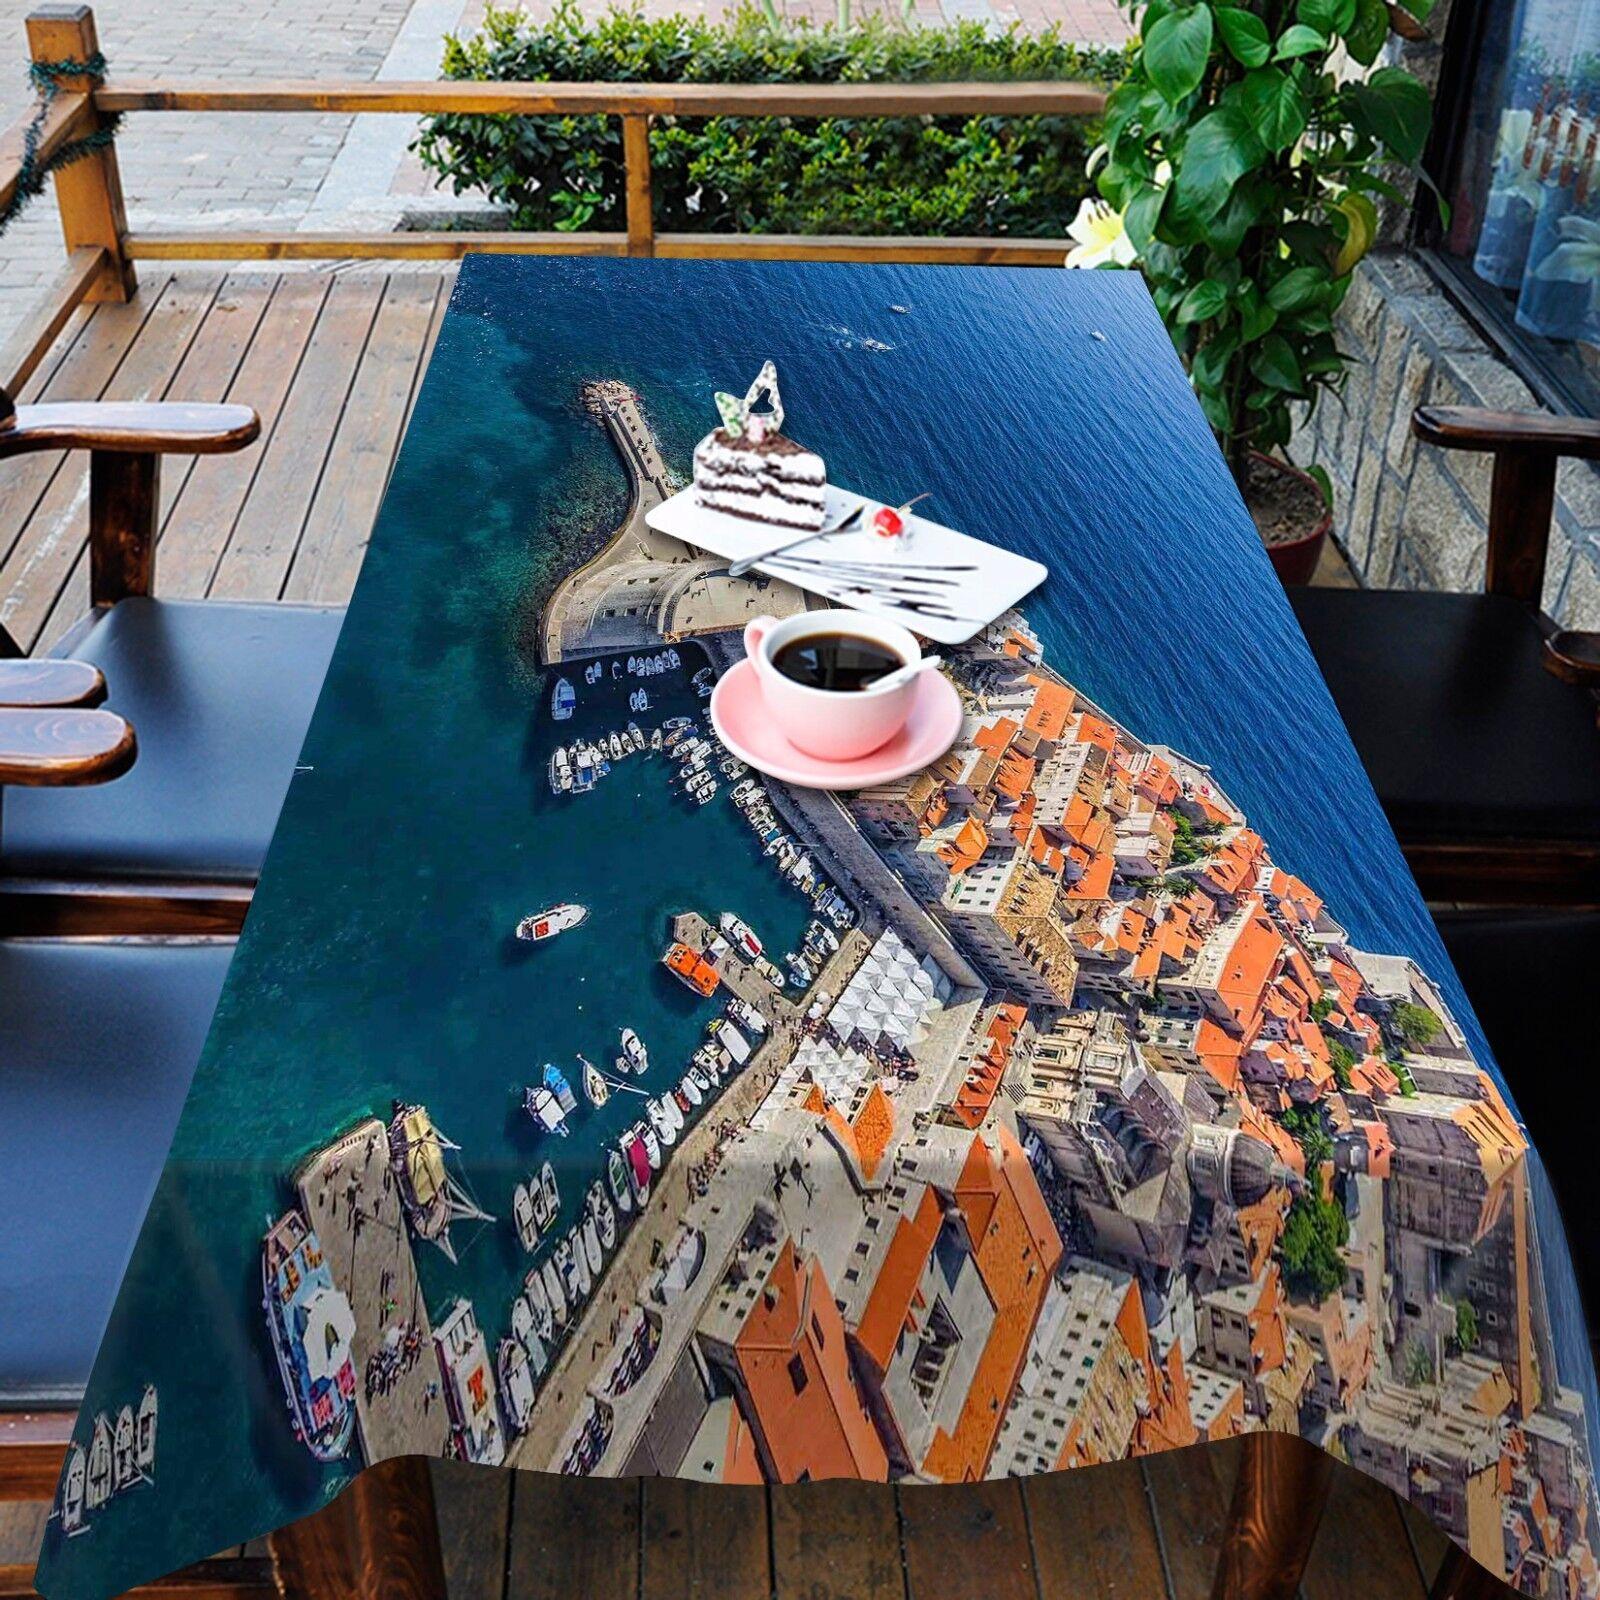 3D Sea City 253 Tablecloth Tablecloth Tablecloth Table Cover Cloth Birthday Party Event AJ WALLPAPER 395e68